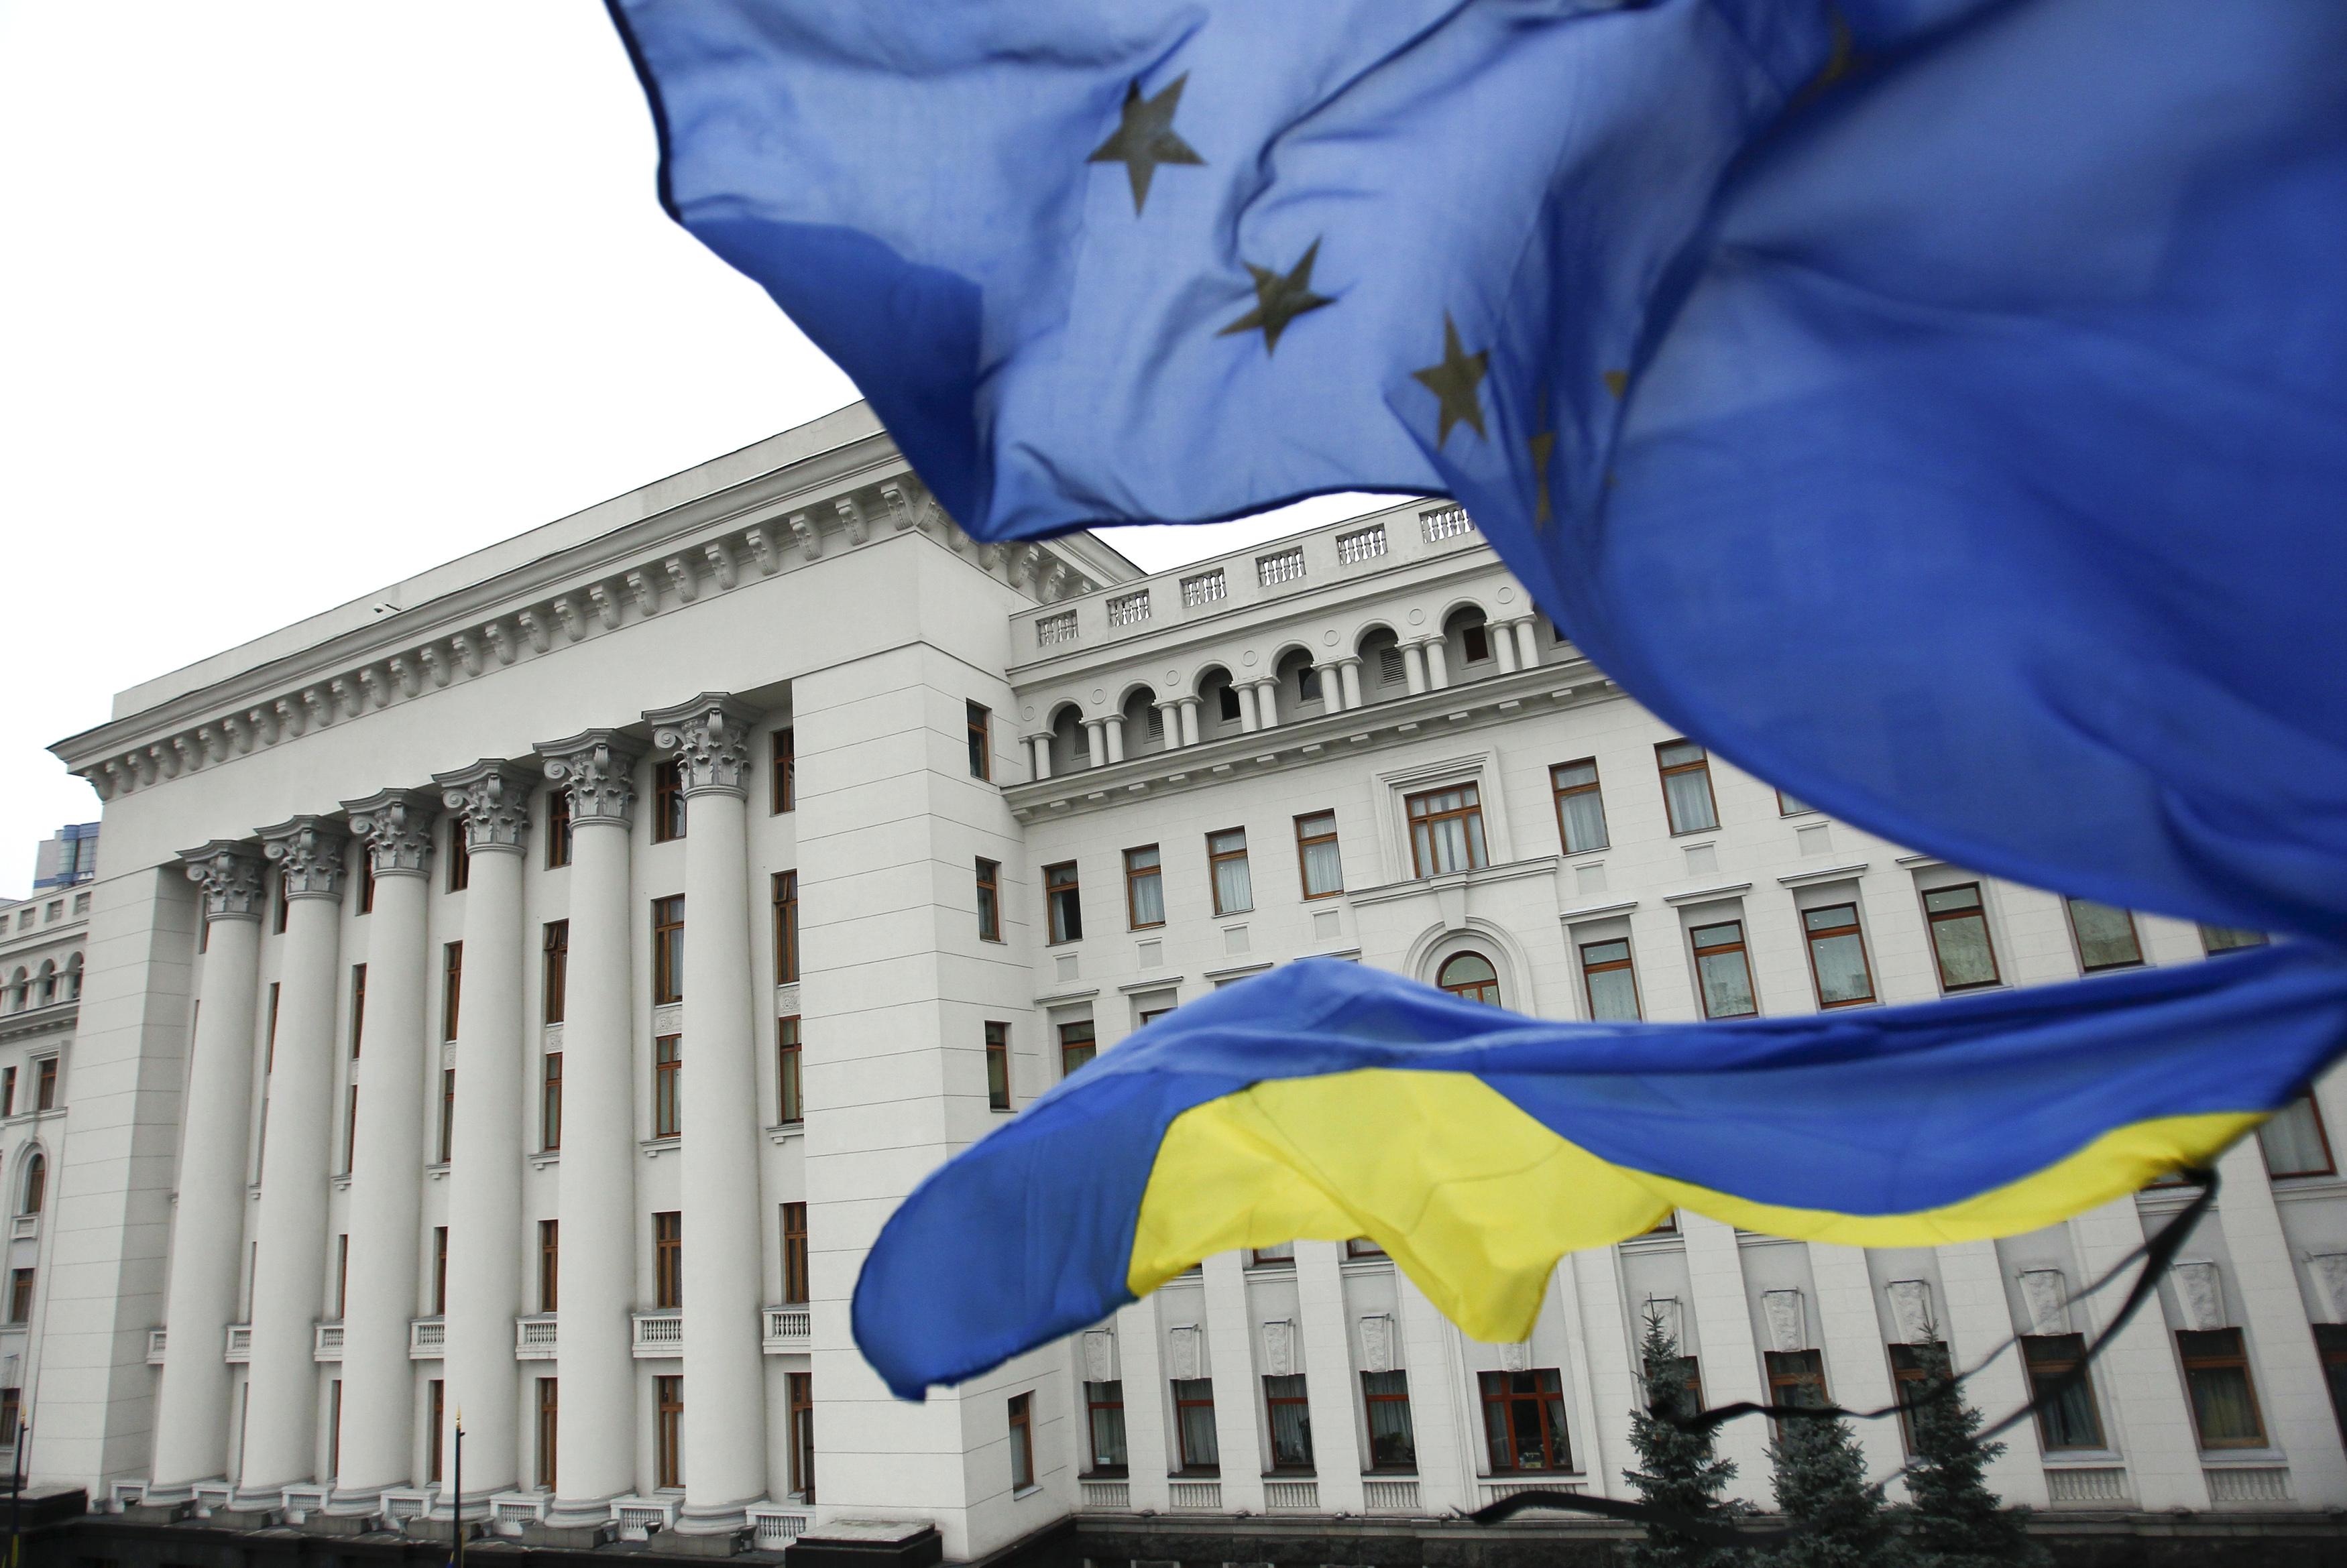 Ukraine election: Cornered Poroshenko 'debates himself' as ...